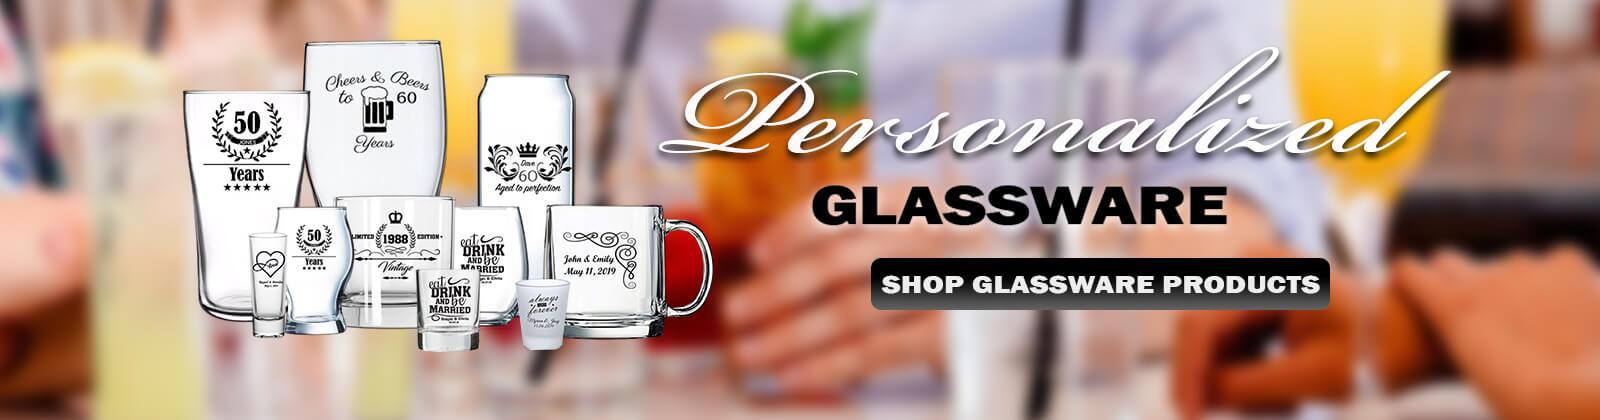 Rich Media Element - Personalized Glassware